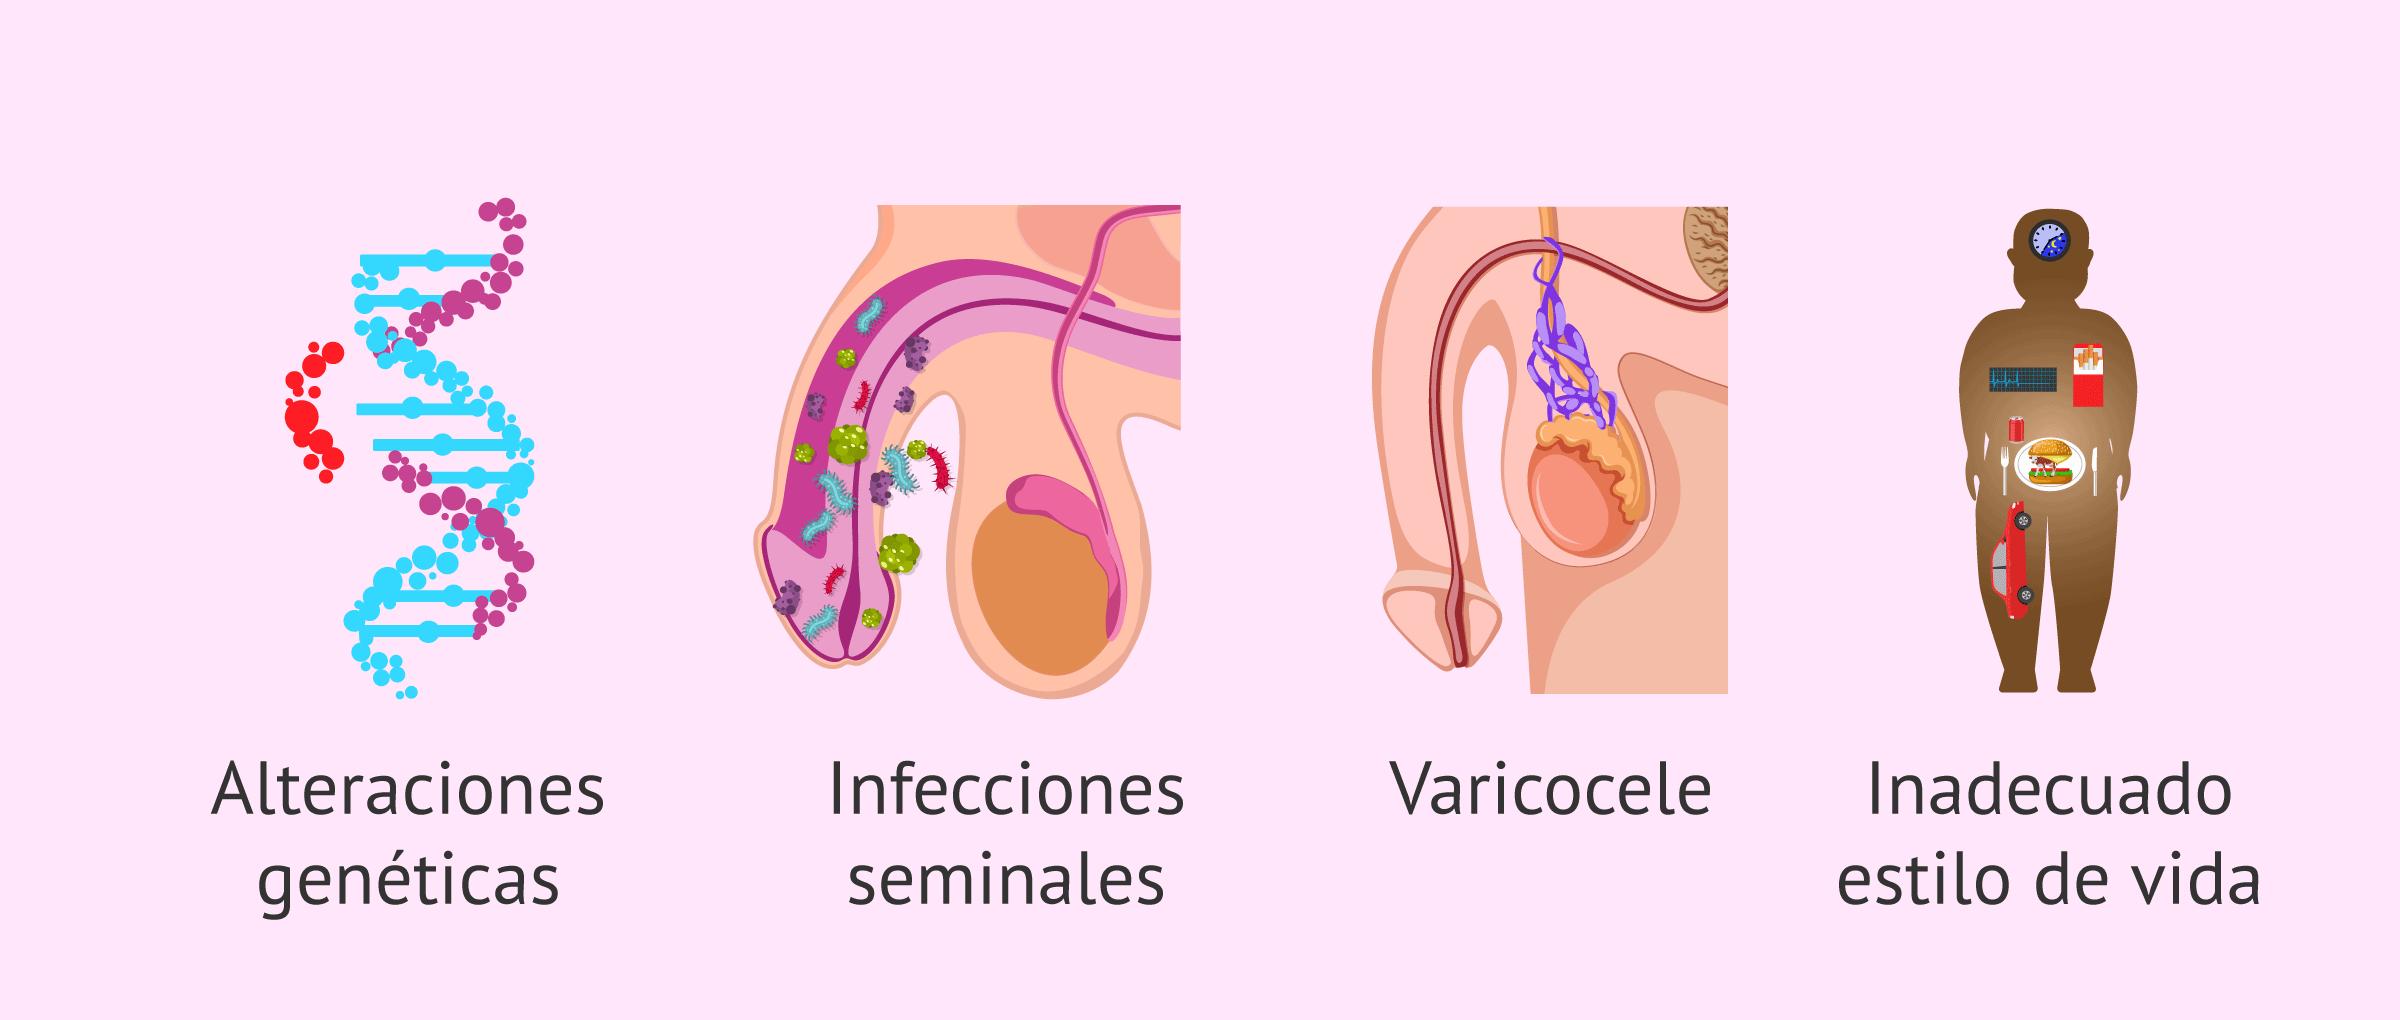 ¿Qué factores provocan teratozoospermia?